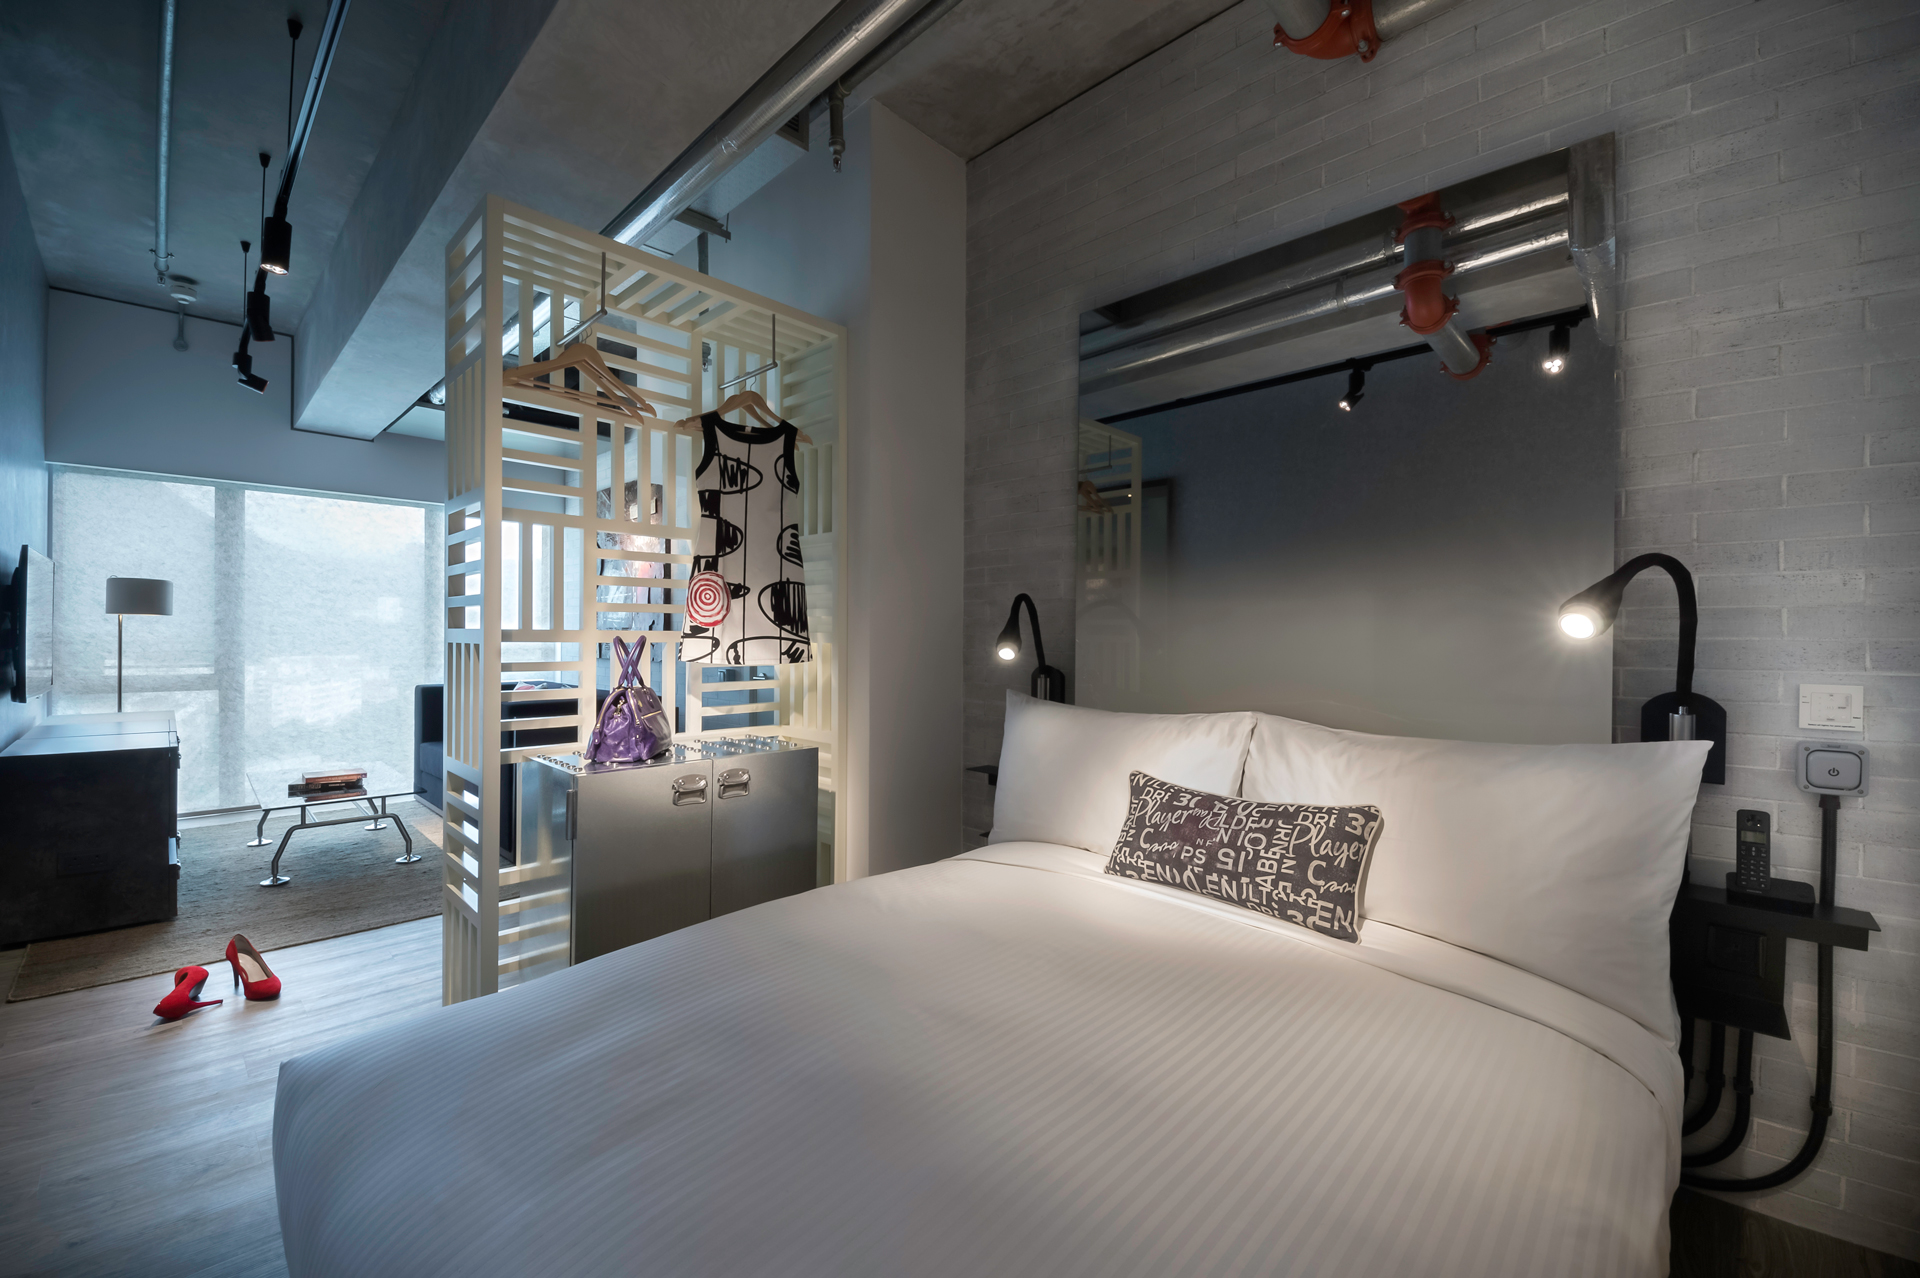 Selayaknya Ovolo Hotels lainnya, Ovolo Southside juga mengutamakan desain yang menawan.